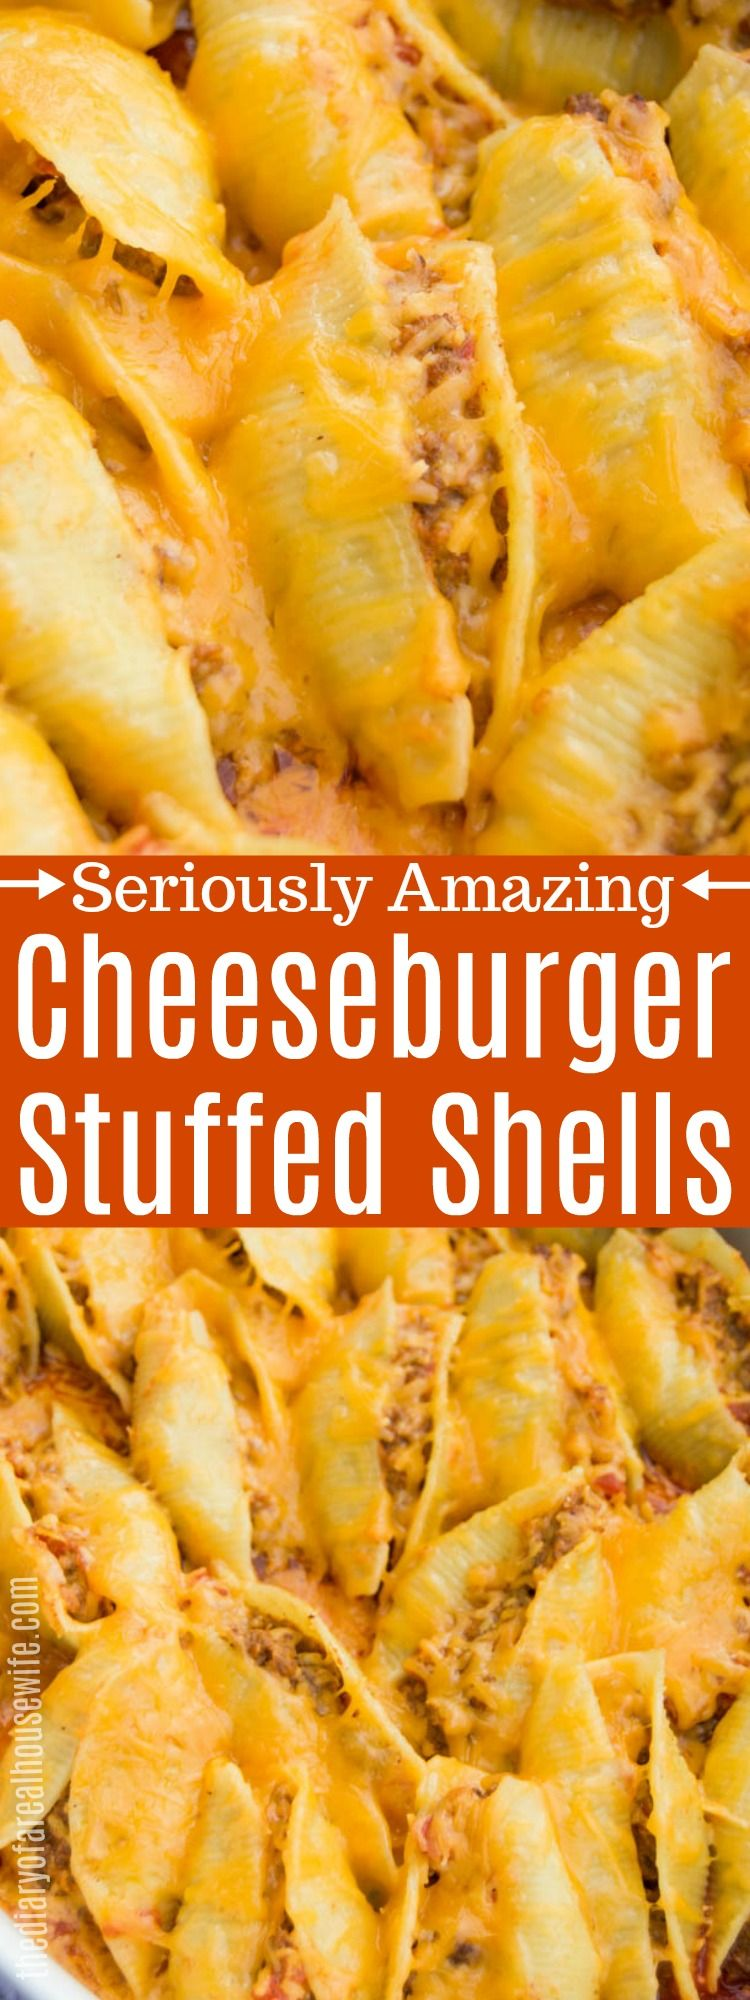 Cheeseburger Stuffed Shells images